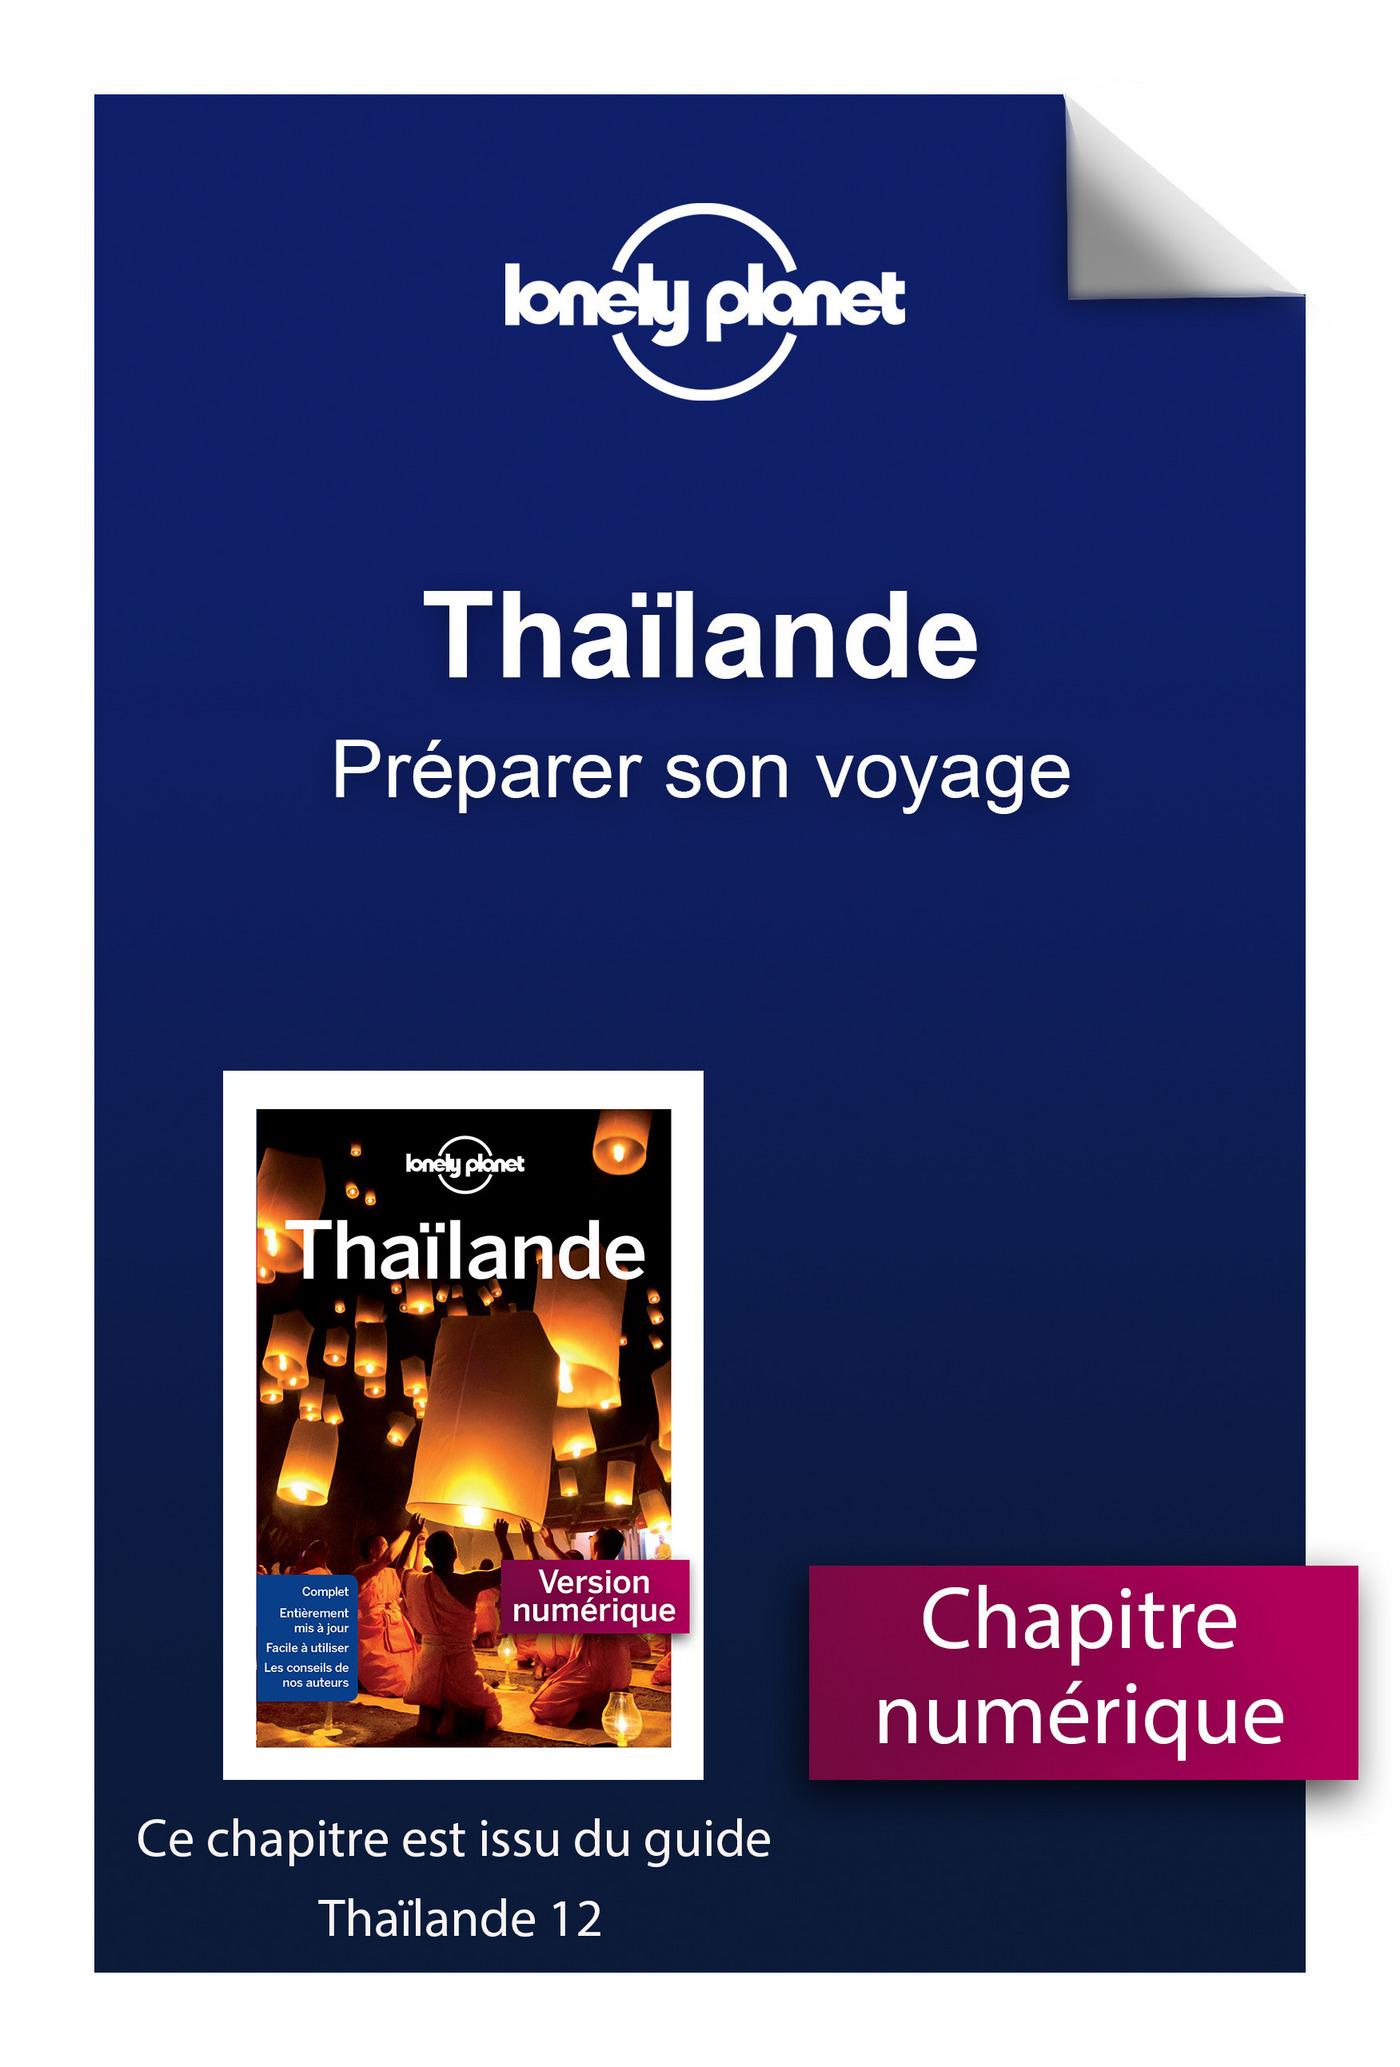 Thaïlande - Préparer son voyage